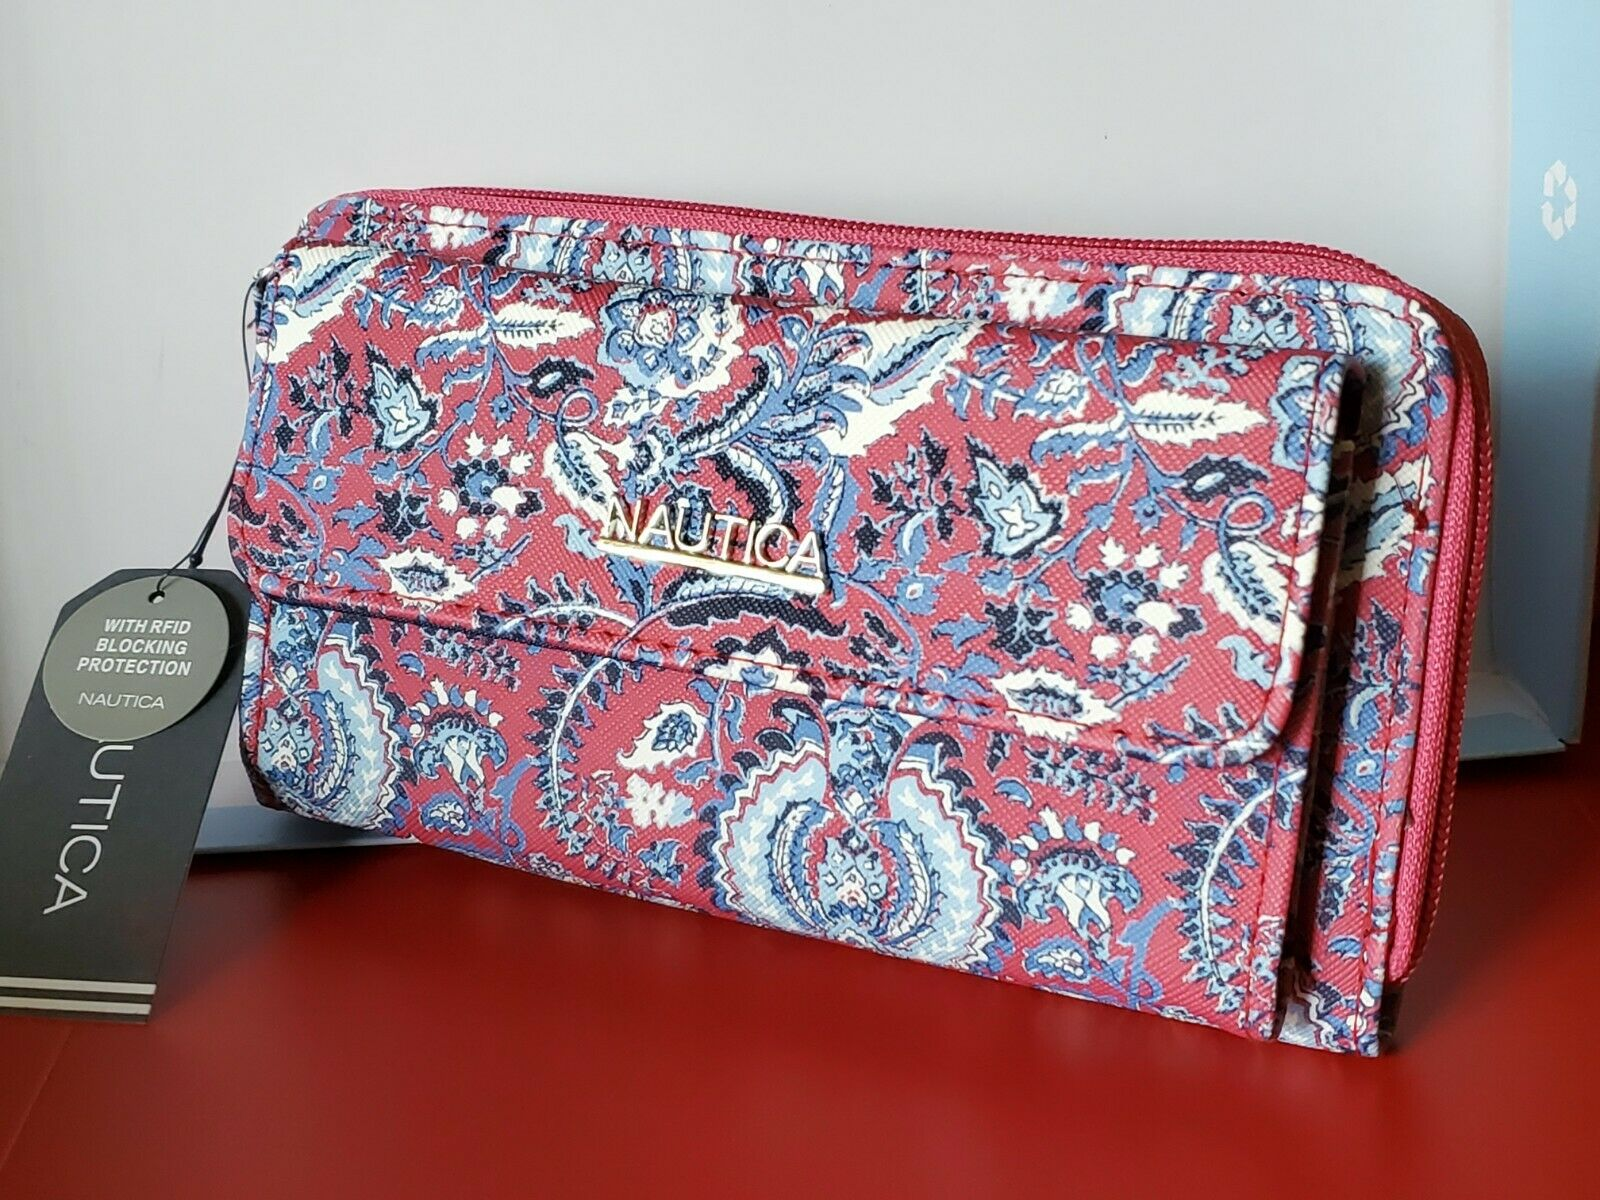 Nautica RFID Ocean Waves Front Pocket Organizer zip-around wallet Pink Paisley